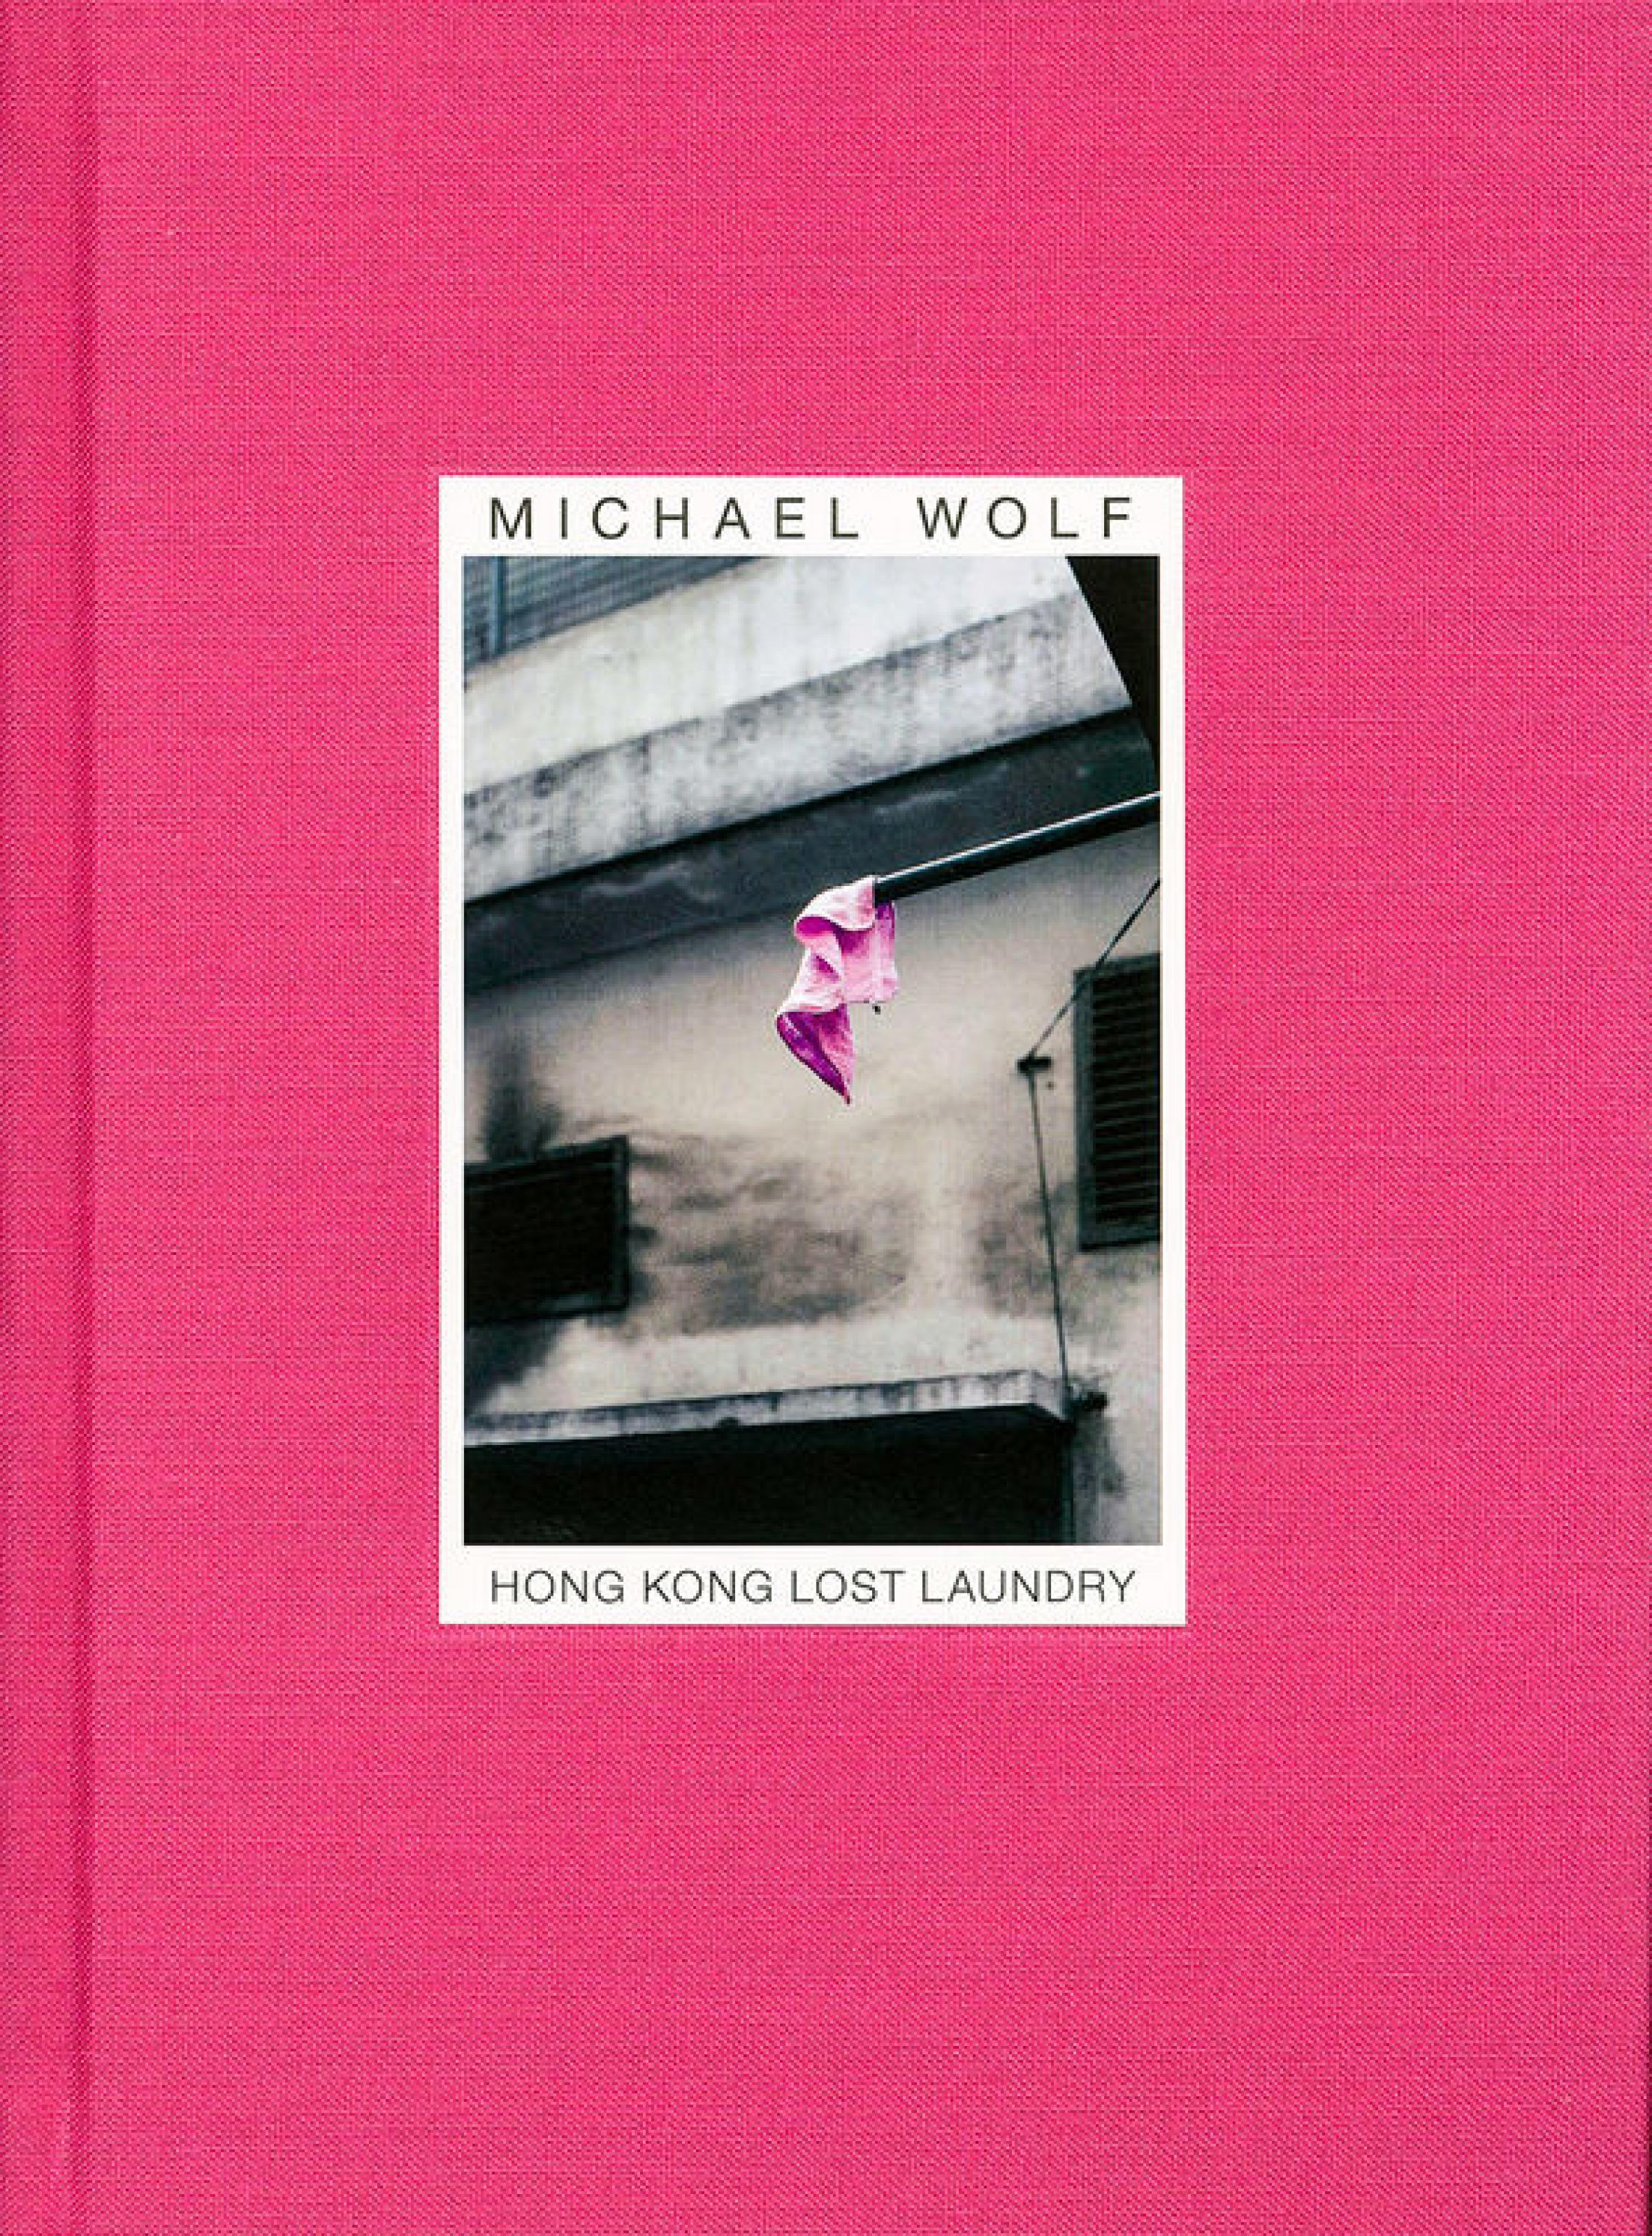 Michael Wolf: Hong Kong Lost Laundry